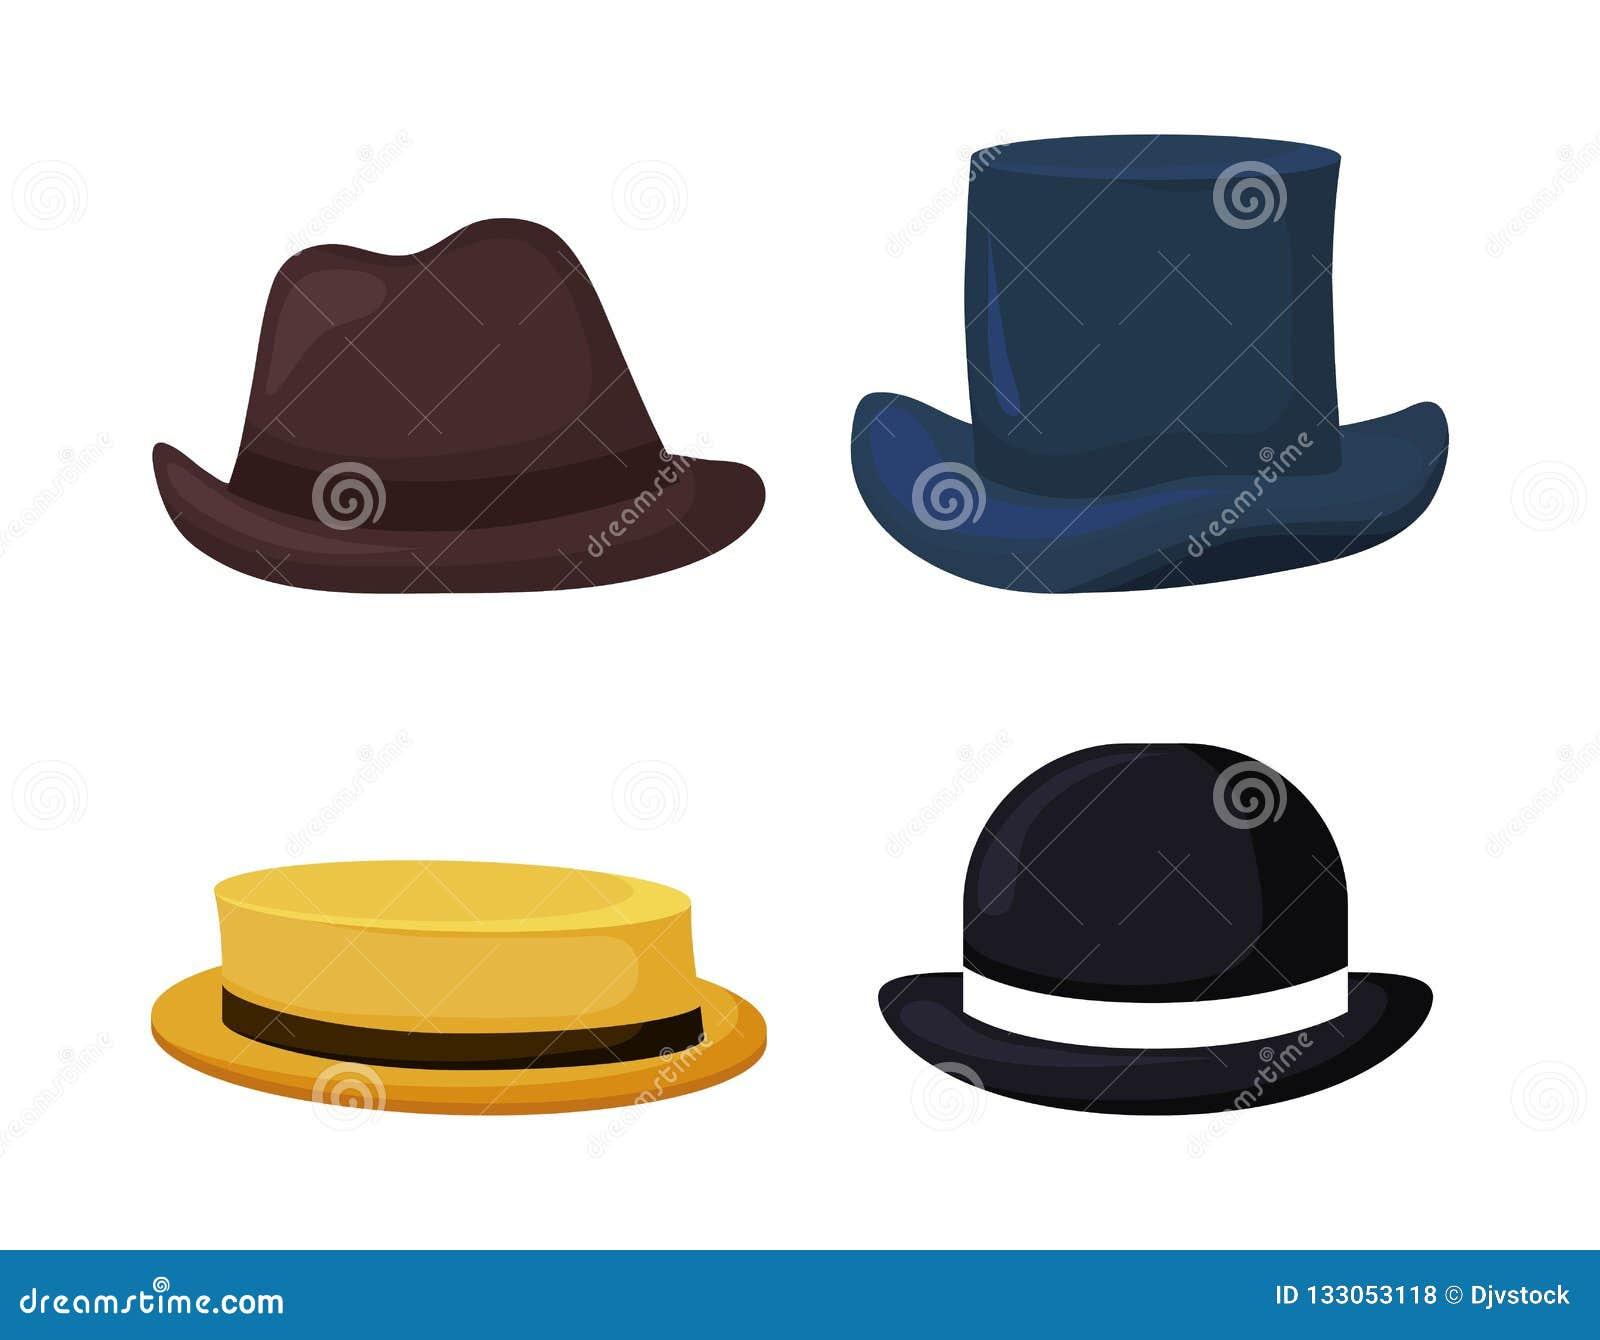 dc1217d1b4c73 Gentleman Hats Stock Illustrations – 445 Gentleman Hats Stock Illustrations